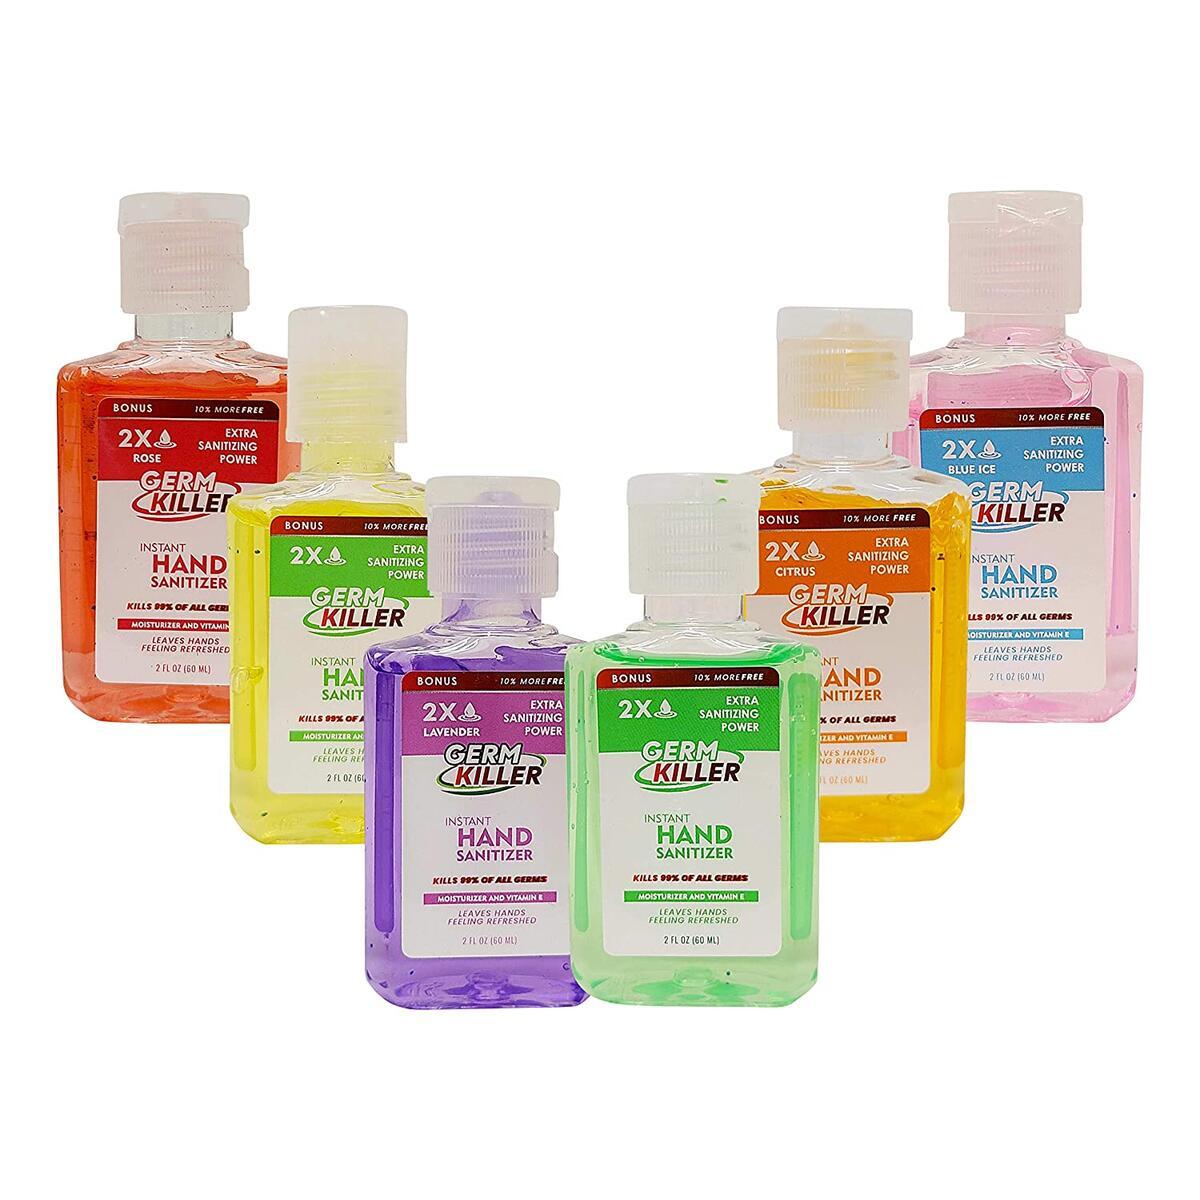 Scented Hand Sanitizer Gel [6 Pack, Assorted] Hand Sanitizer, Scented Portable Pocket Size Flavored Hand Sanitizer Gel Pack